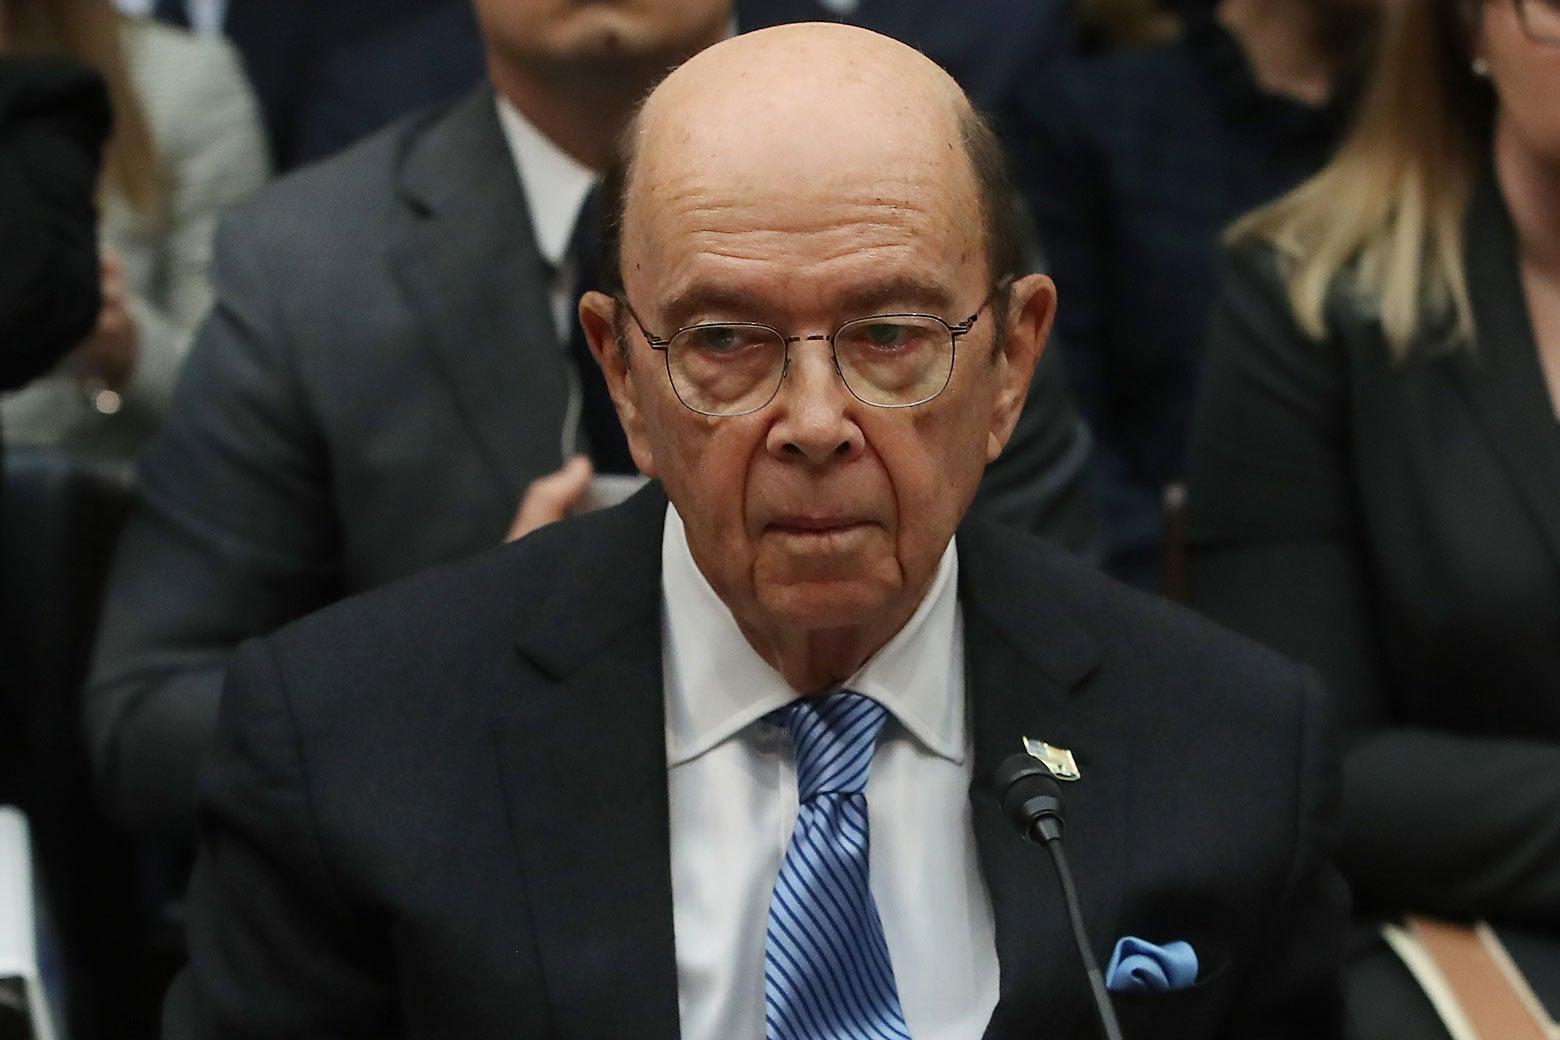 U.S. Commerce Secretary Wilbur Ross testifies on Capitol Hill on March 14 in Washington.